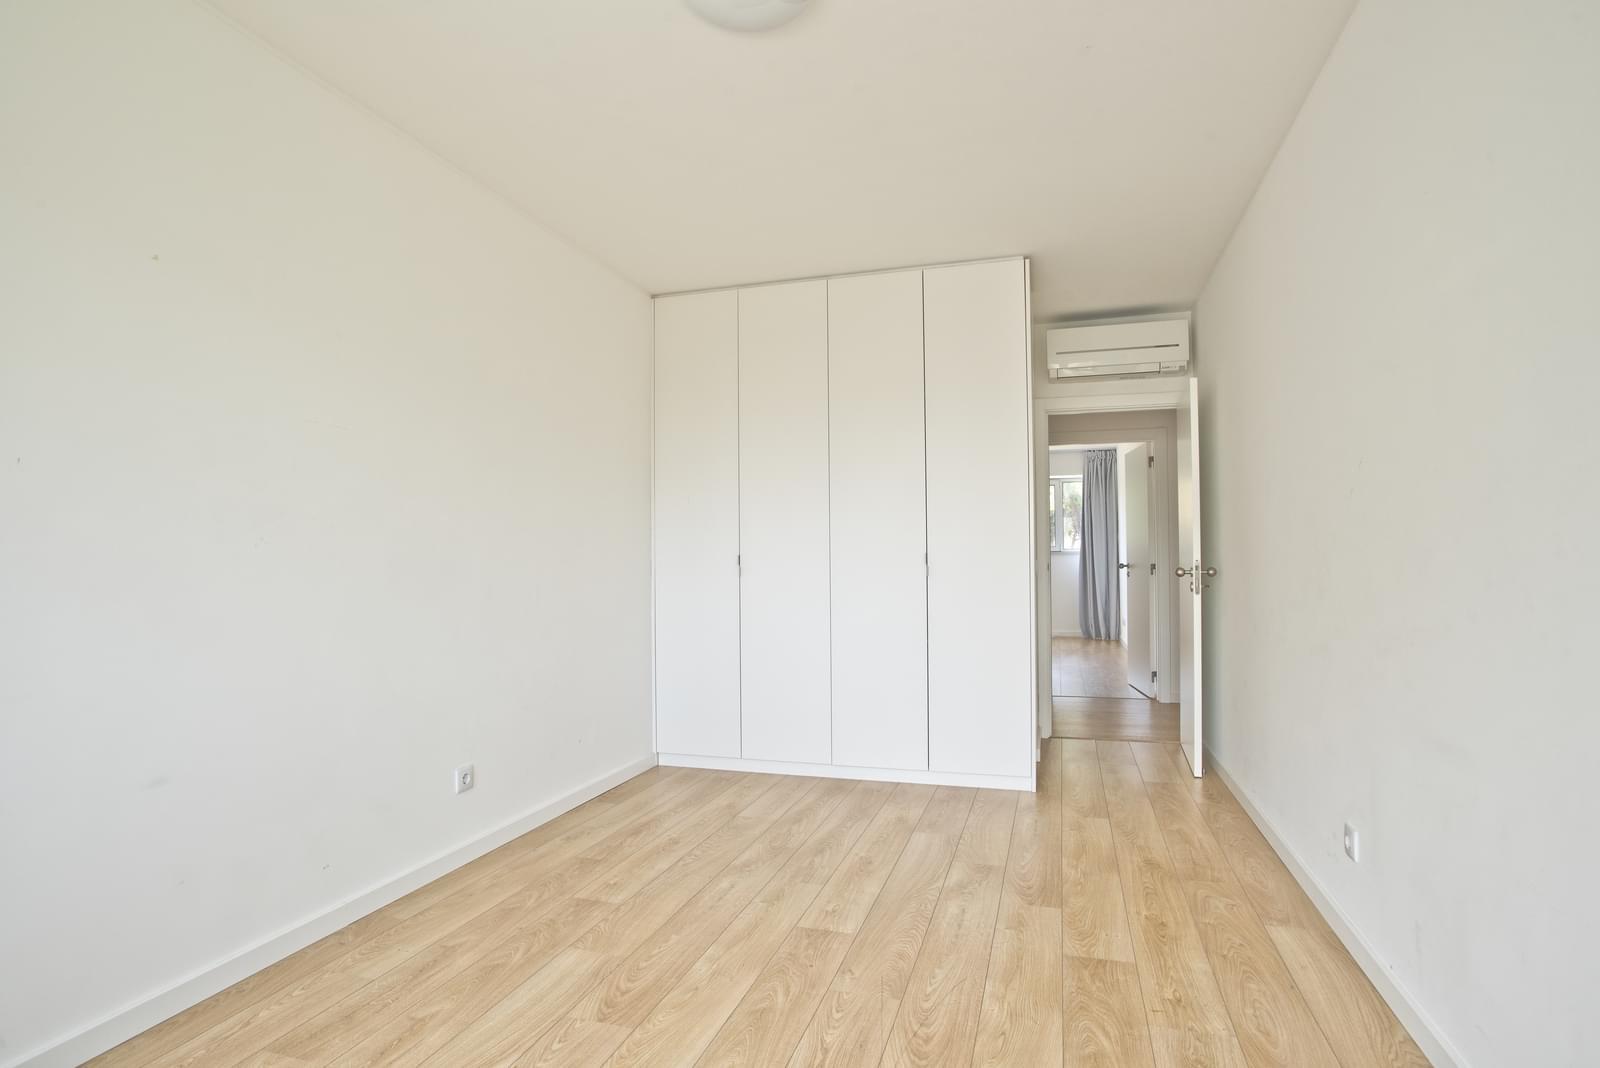 pf13975-apartamento-t4-oeiras-cb4f66de-4e45-4170-83d4-d19a34b33354